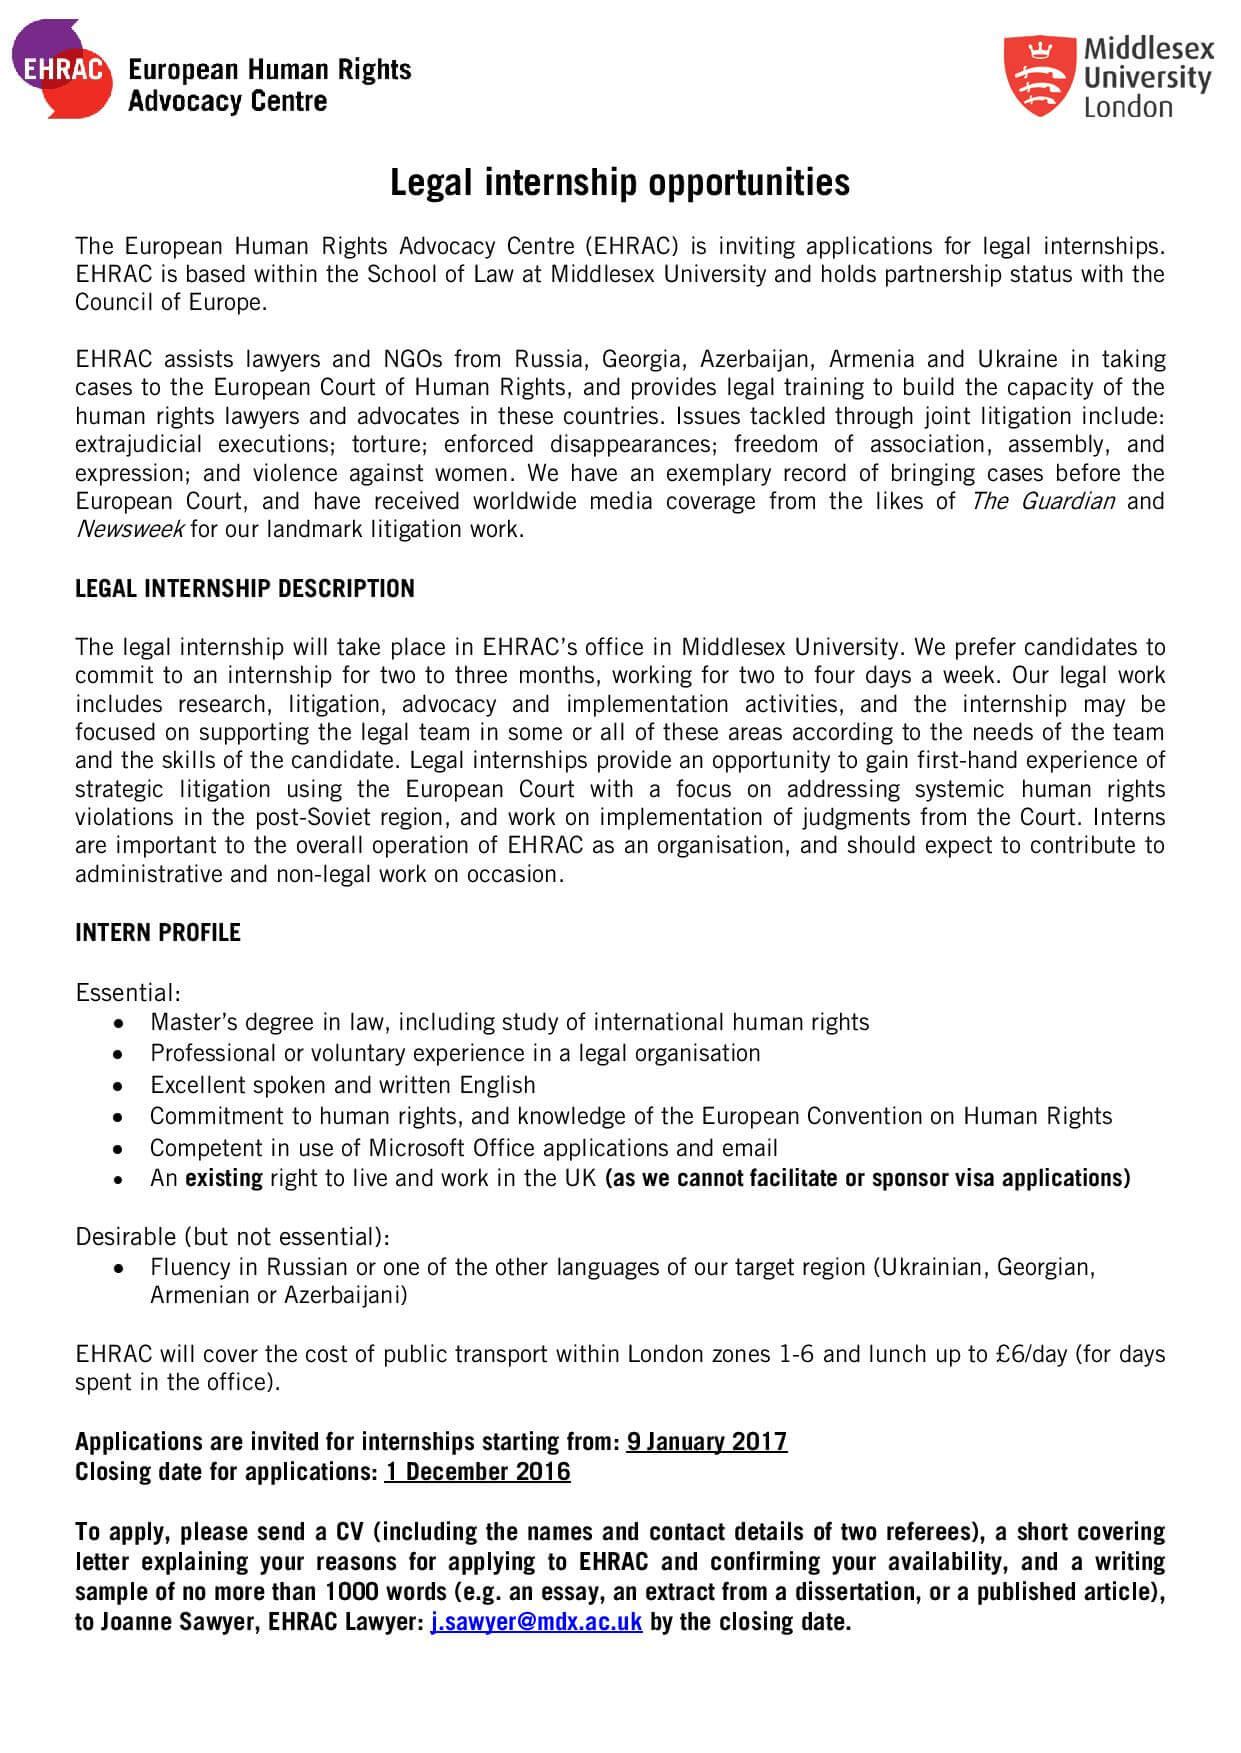 Internship at the European Human Rights Advocacy Centre